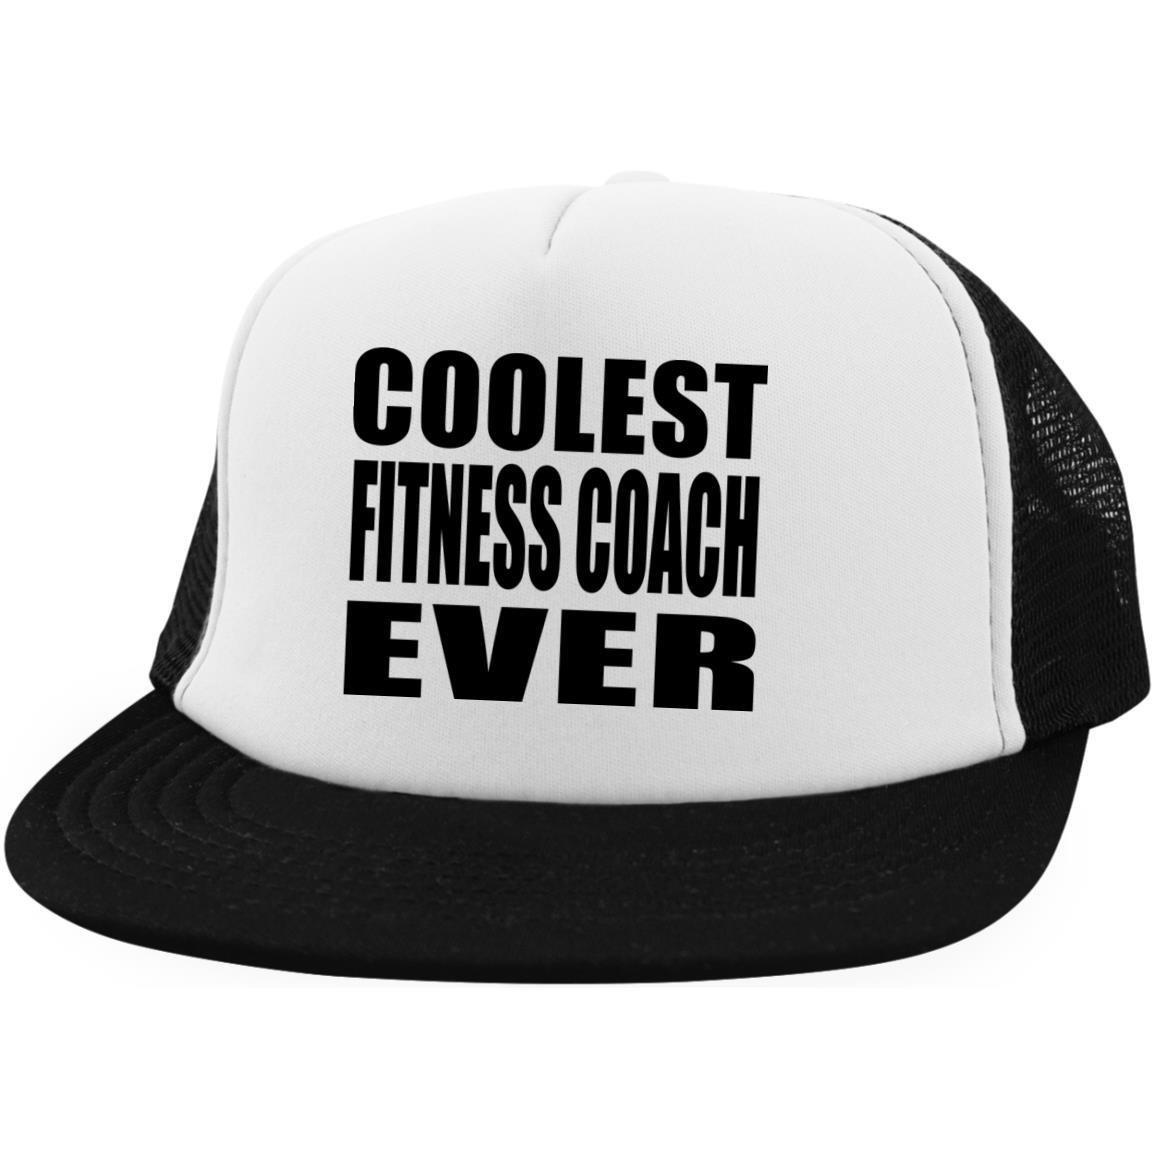 Designsify Coolest Fitness Coach Ever - Trucker Hat Visera, Gorra ...